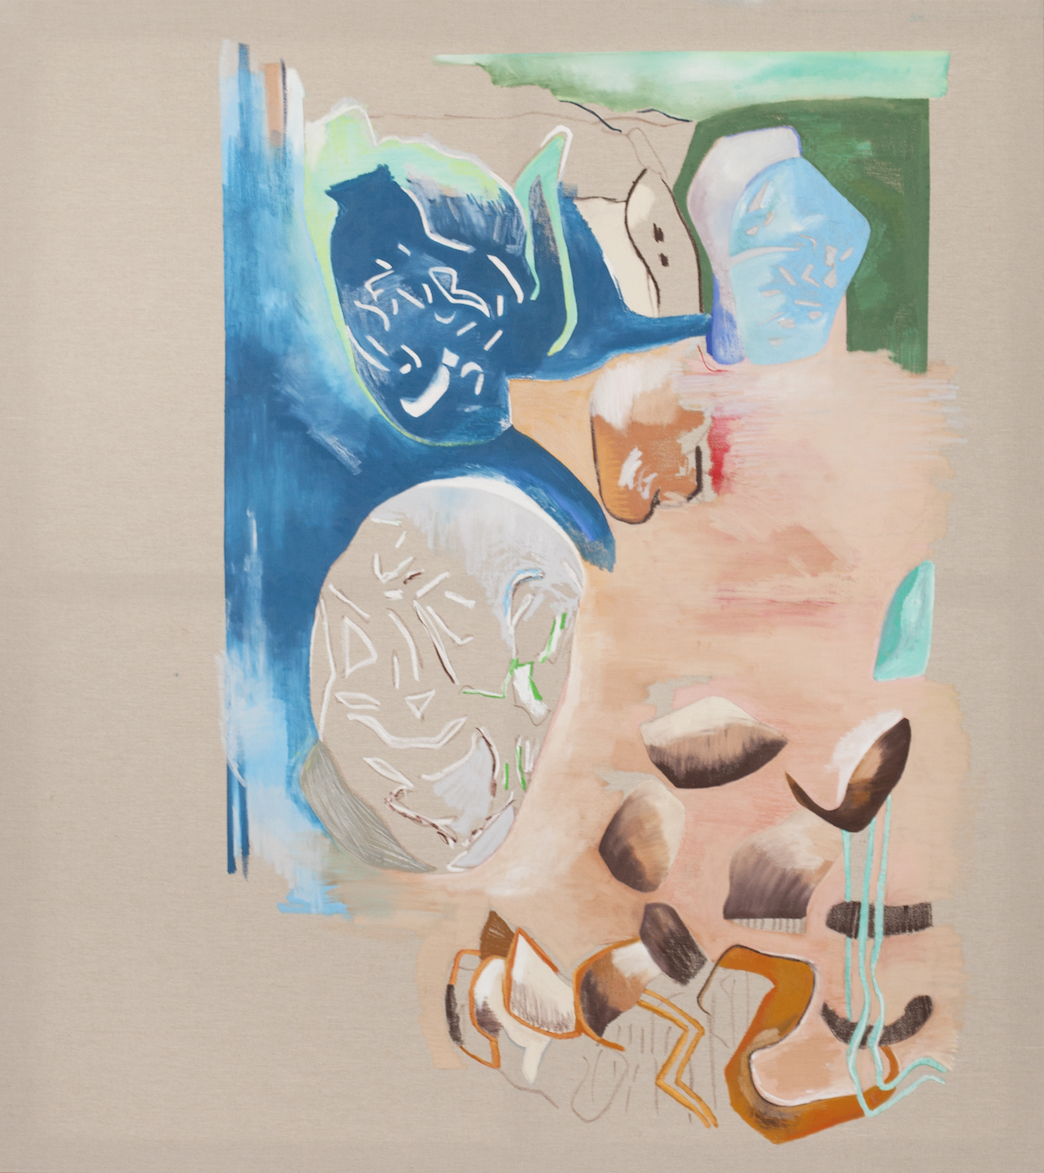 Florentijn de Boer How happy is the little stone 2019 Oilbar on canvas 180 by 160 cm